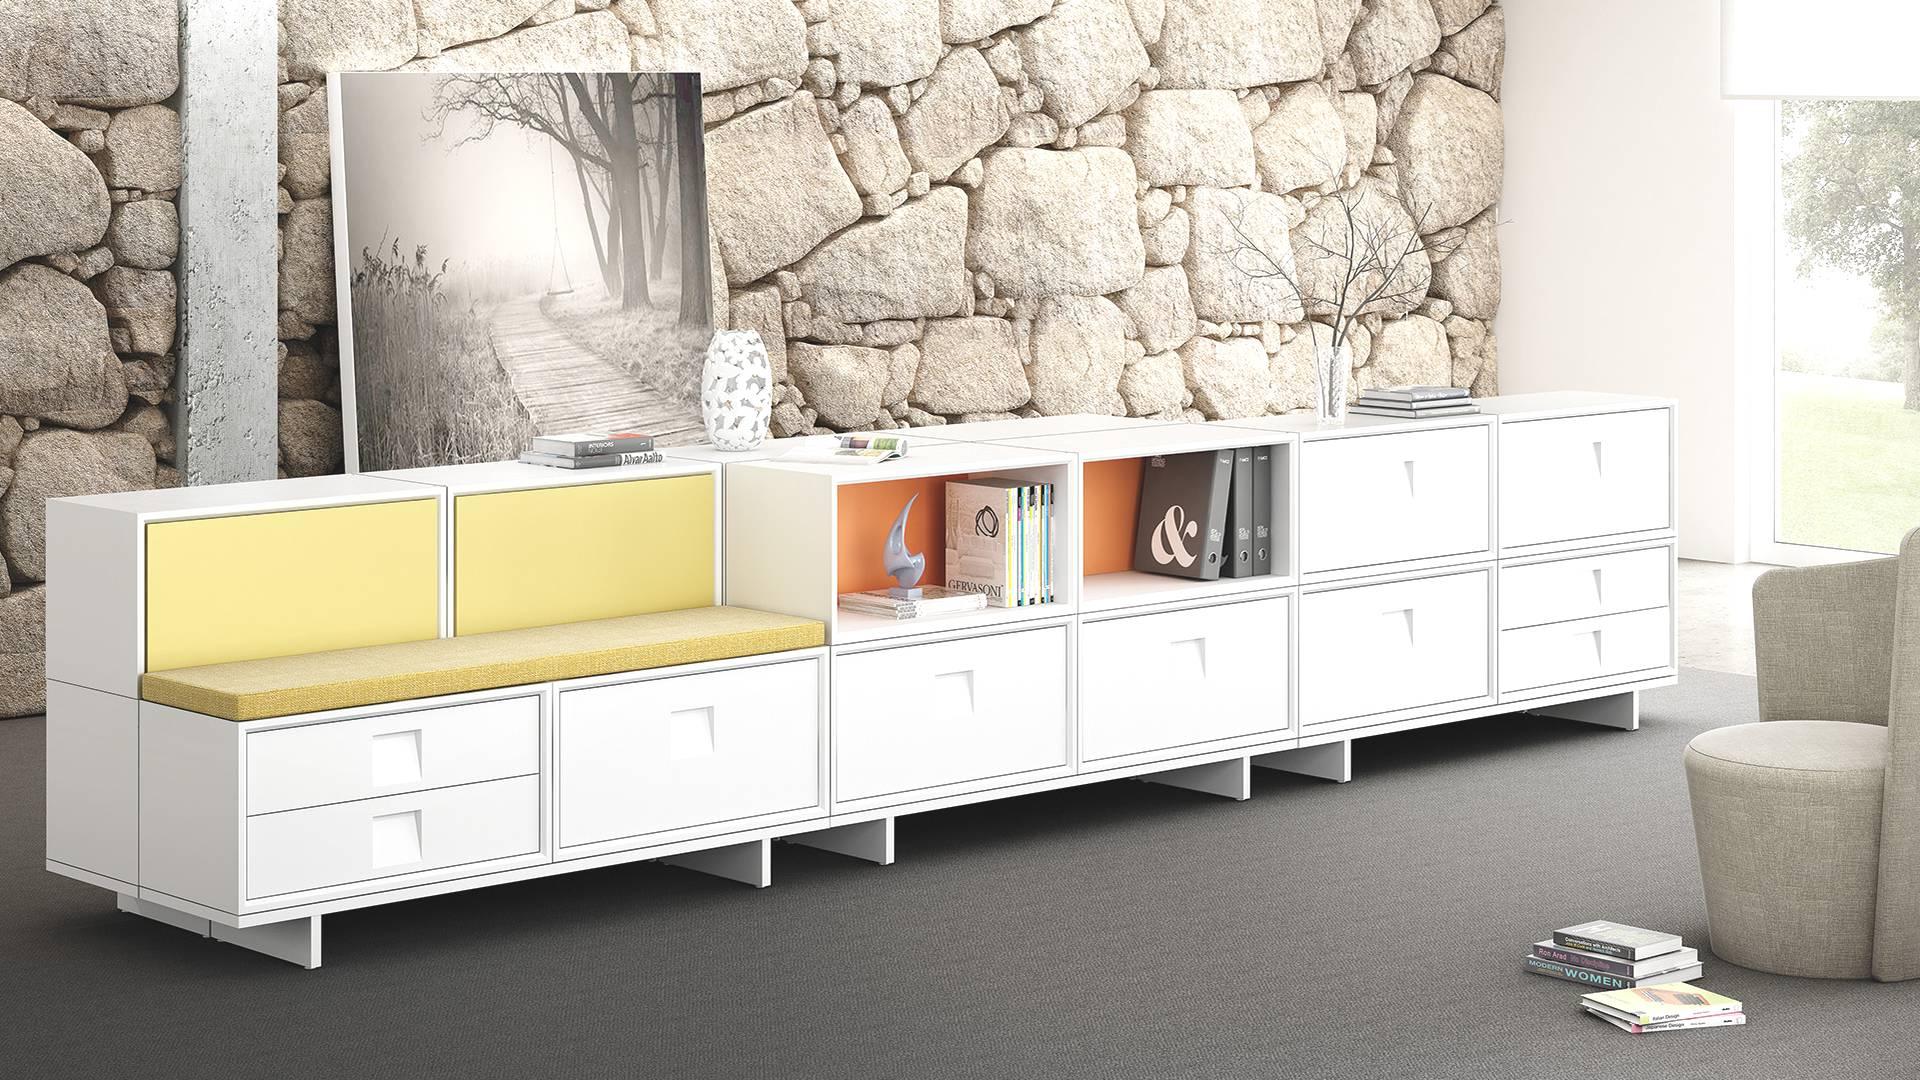 ligne gbox famo recto verso. Black Bedroom Furniture Sets. Home Design Ideas